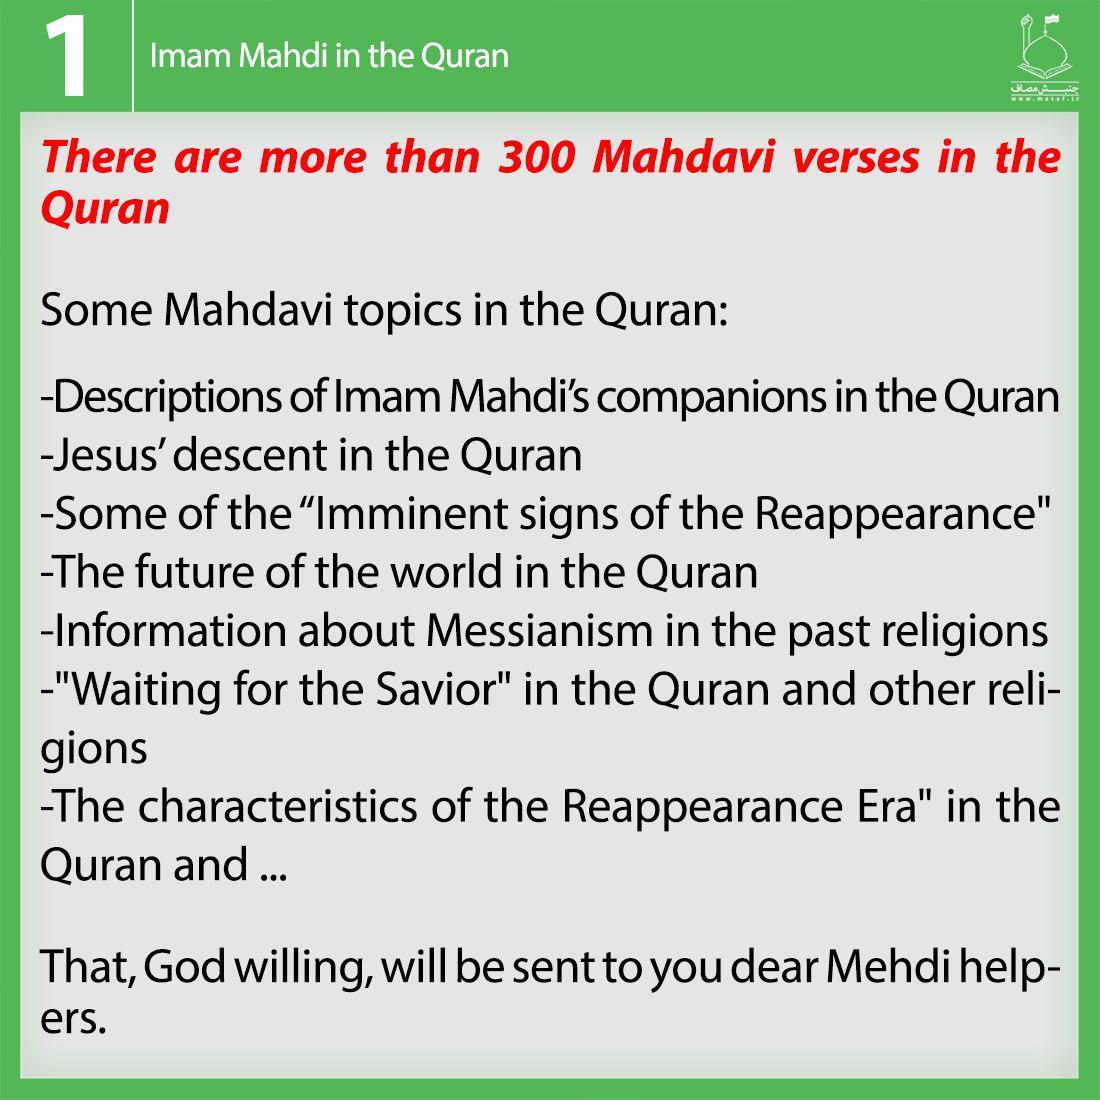 imam mahdi in the quran